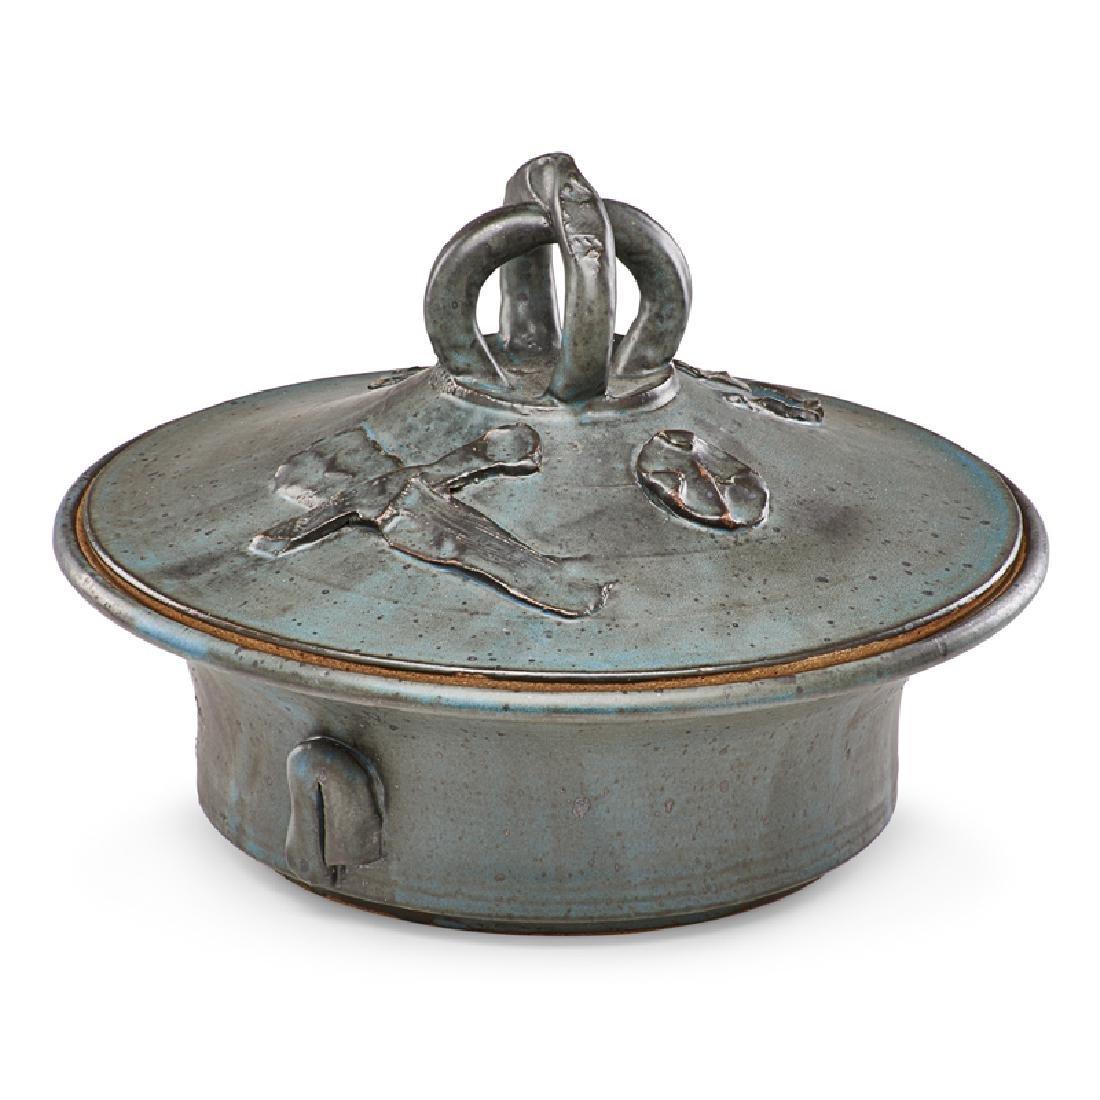 ROBERT TURNER Large stoneware lidded vessel